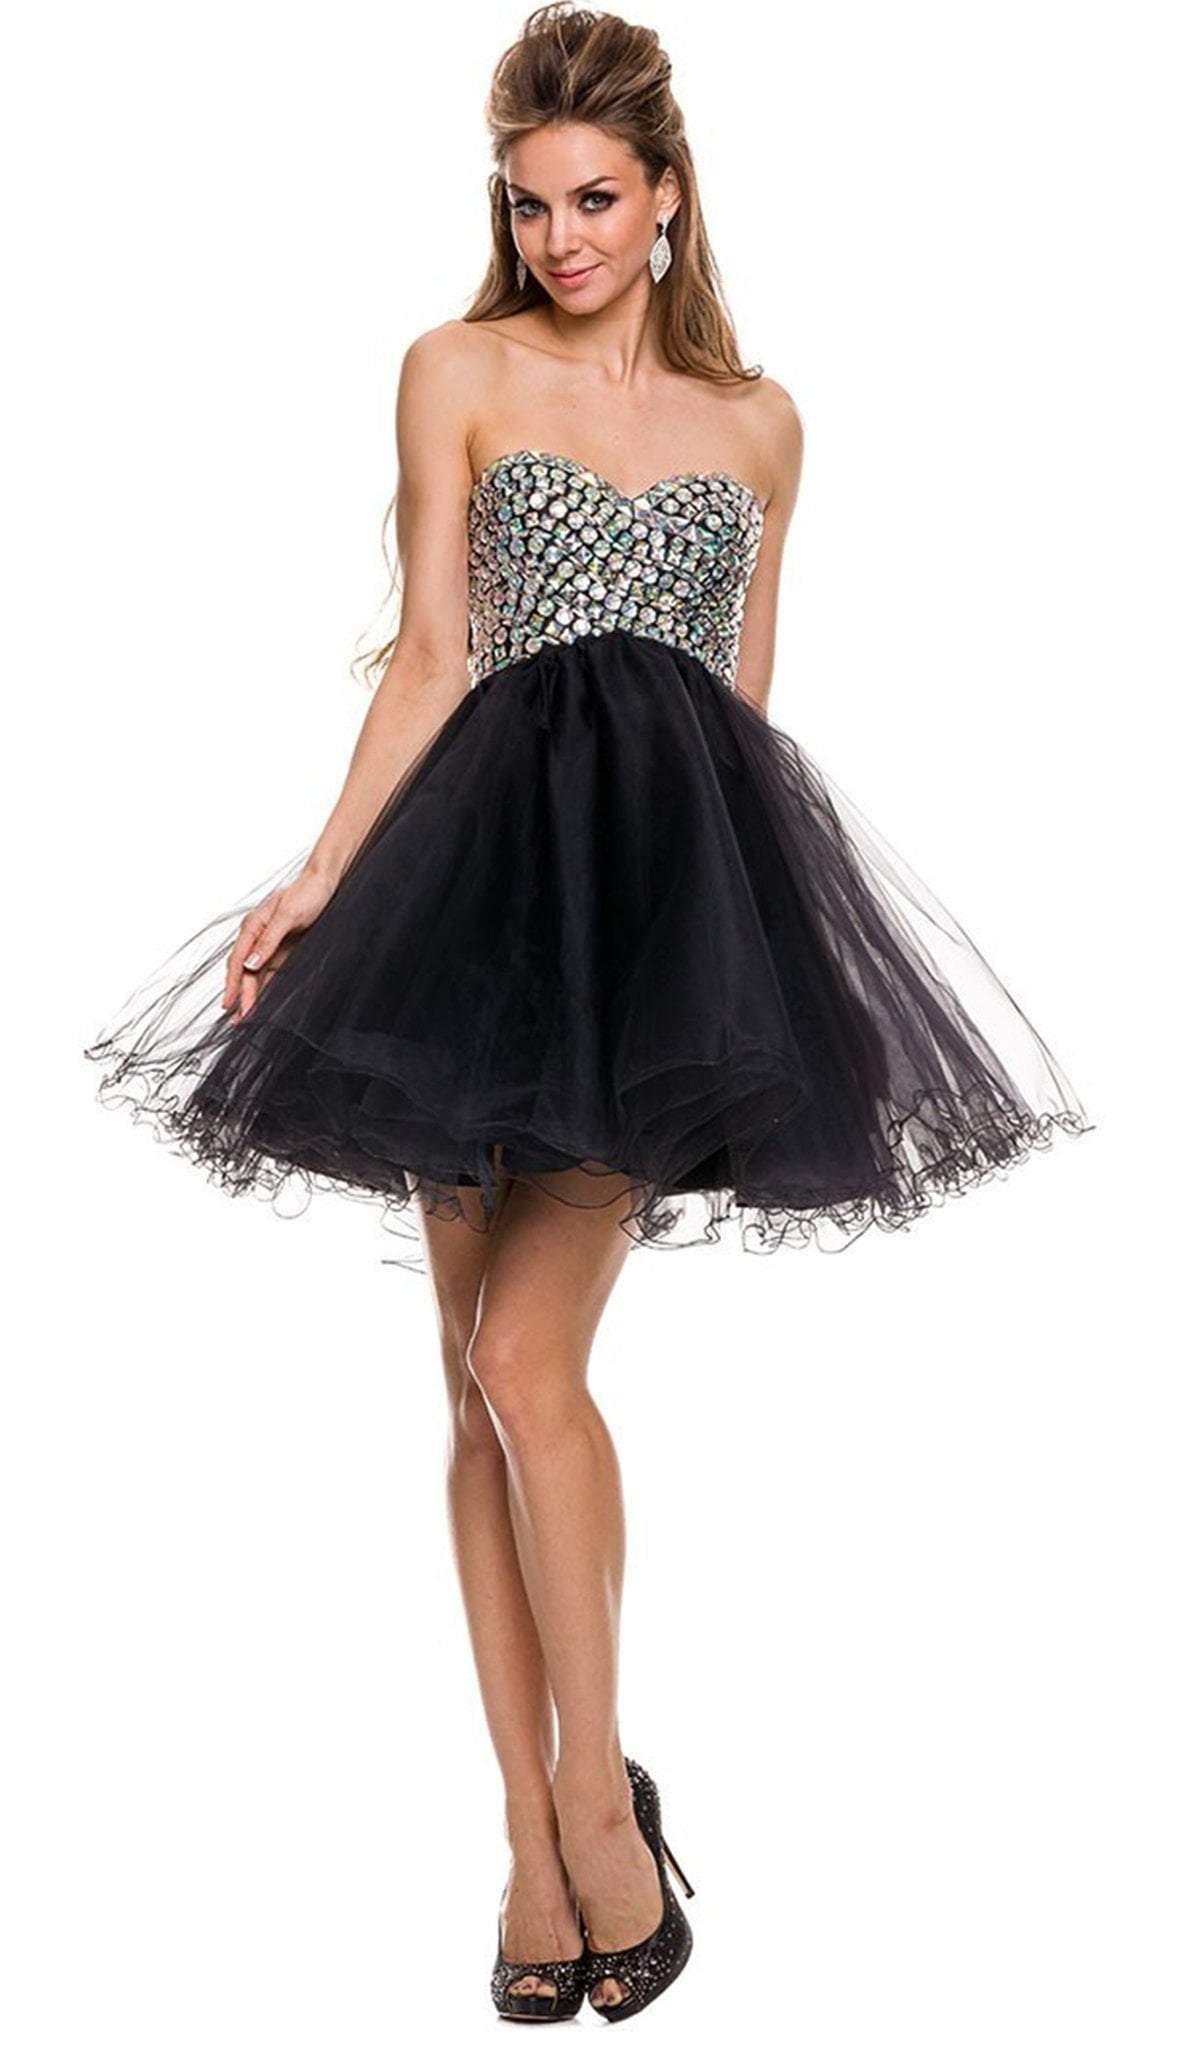 Nox Anabel - 6010 Beaded Sweetheart A-Line Dress